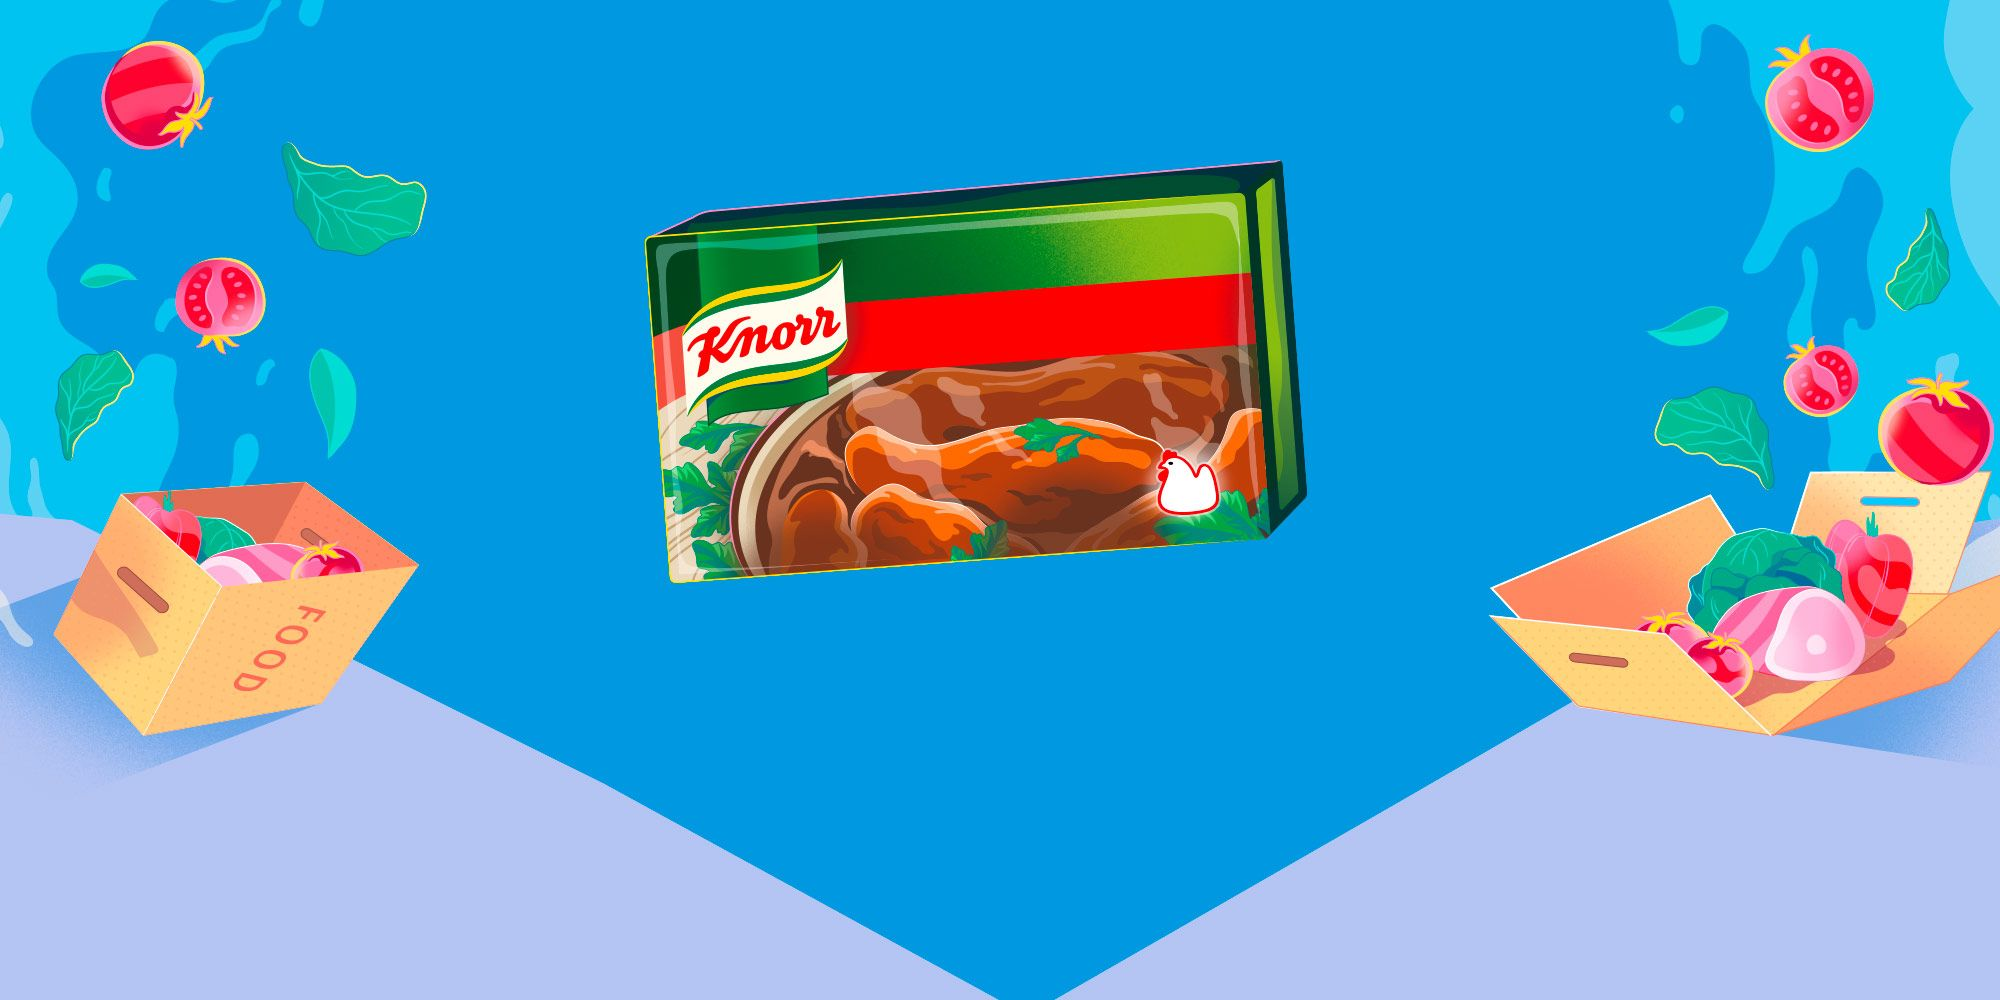 Knorr gif header